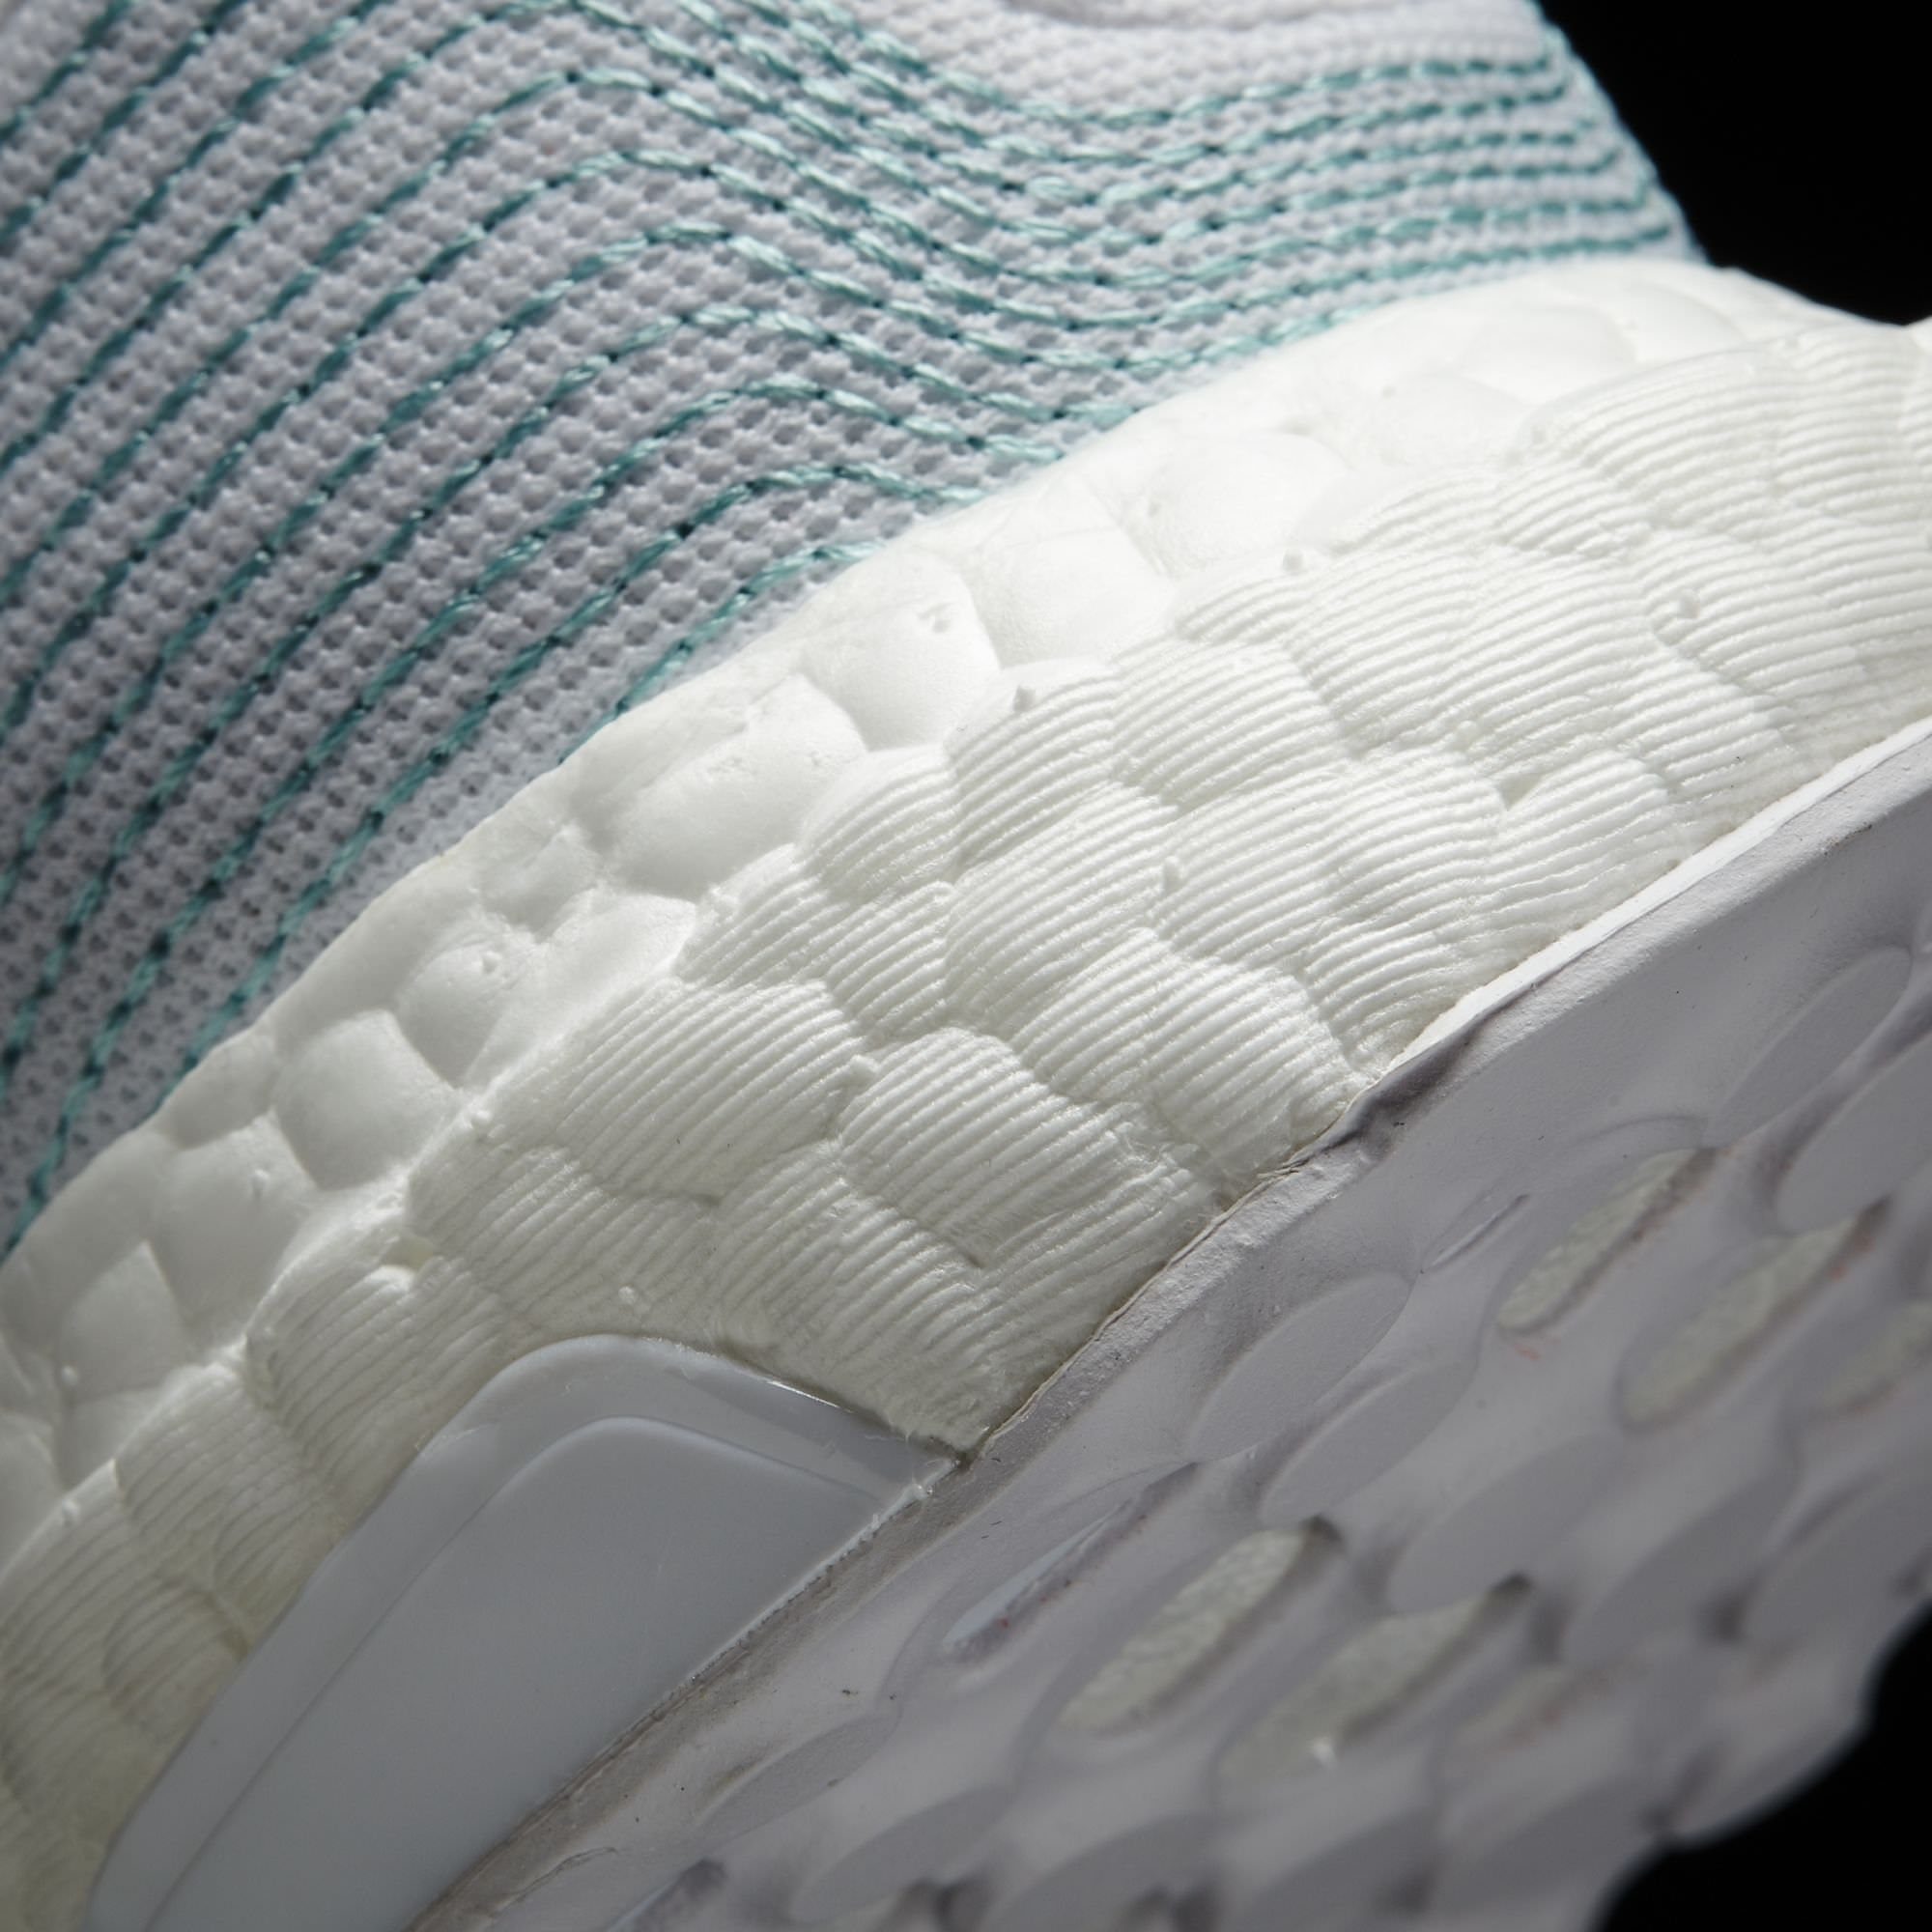 adidas UltraBOOST Uncaged Parley Der Meeresabfall Sneaker